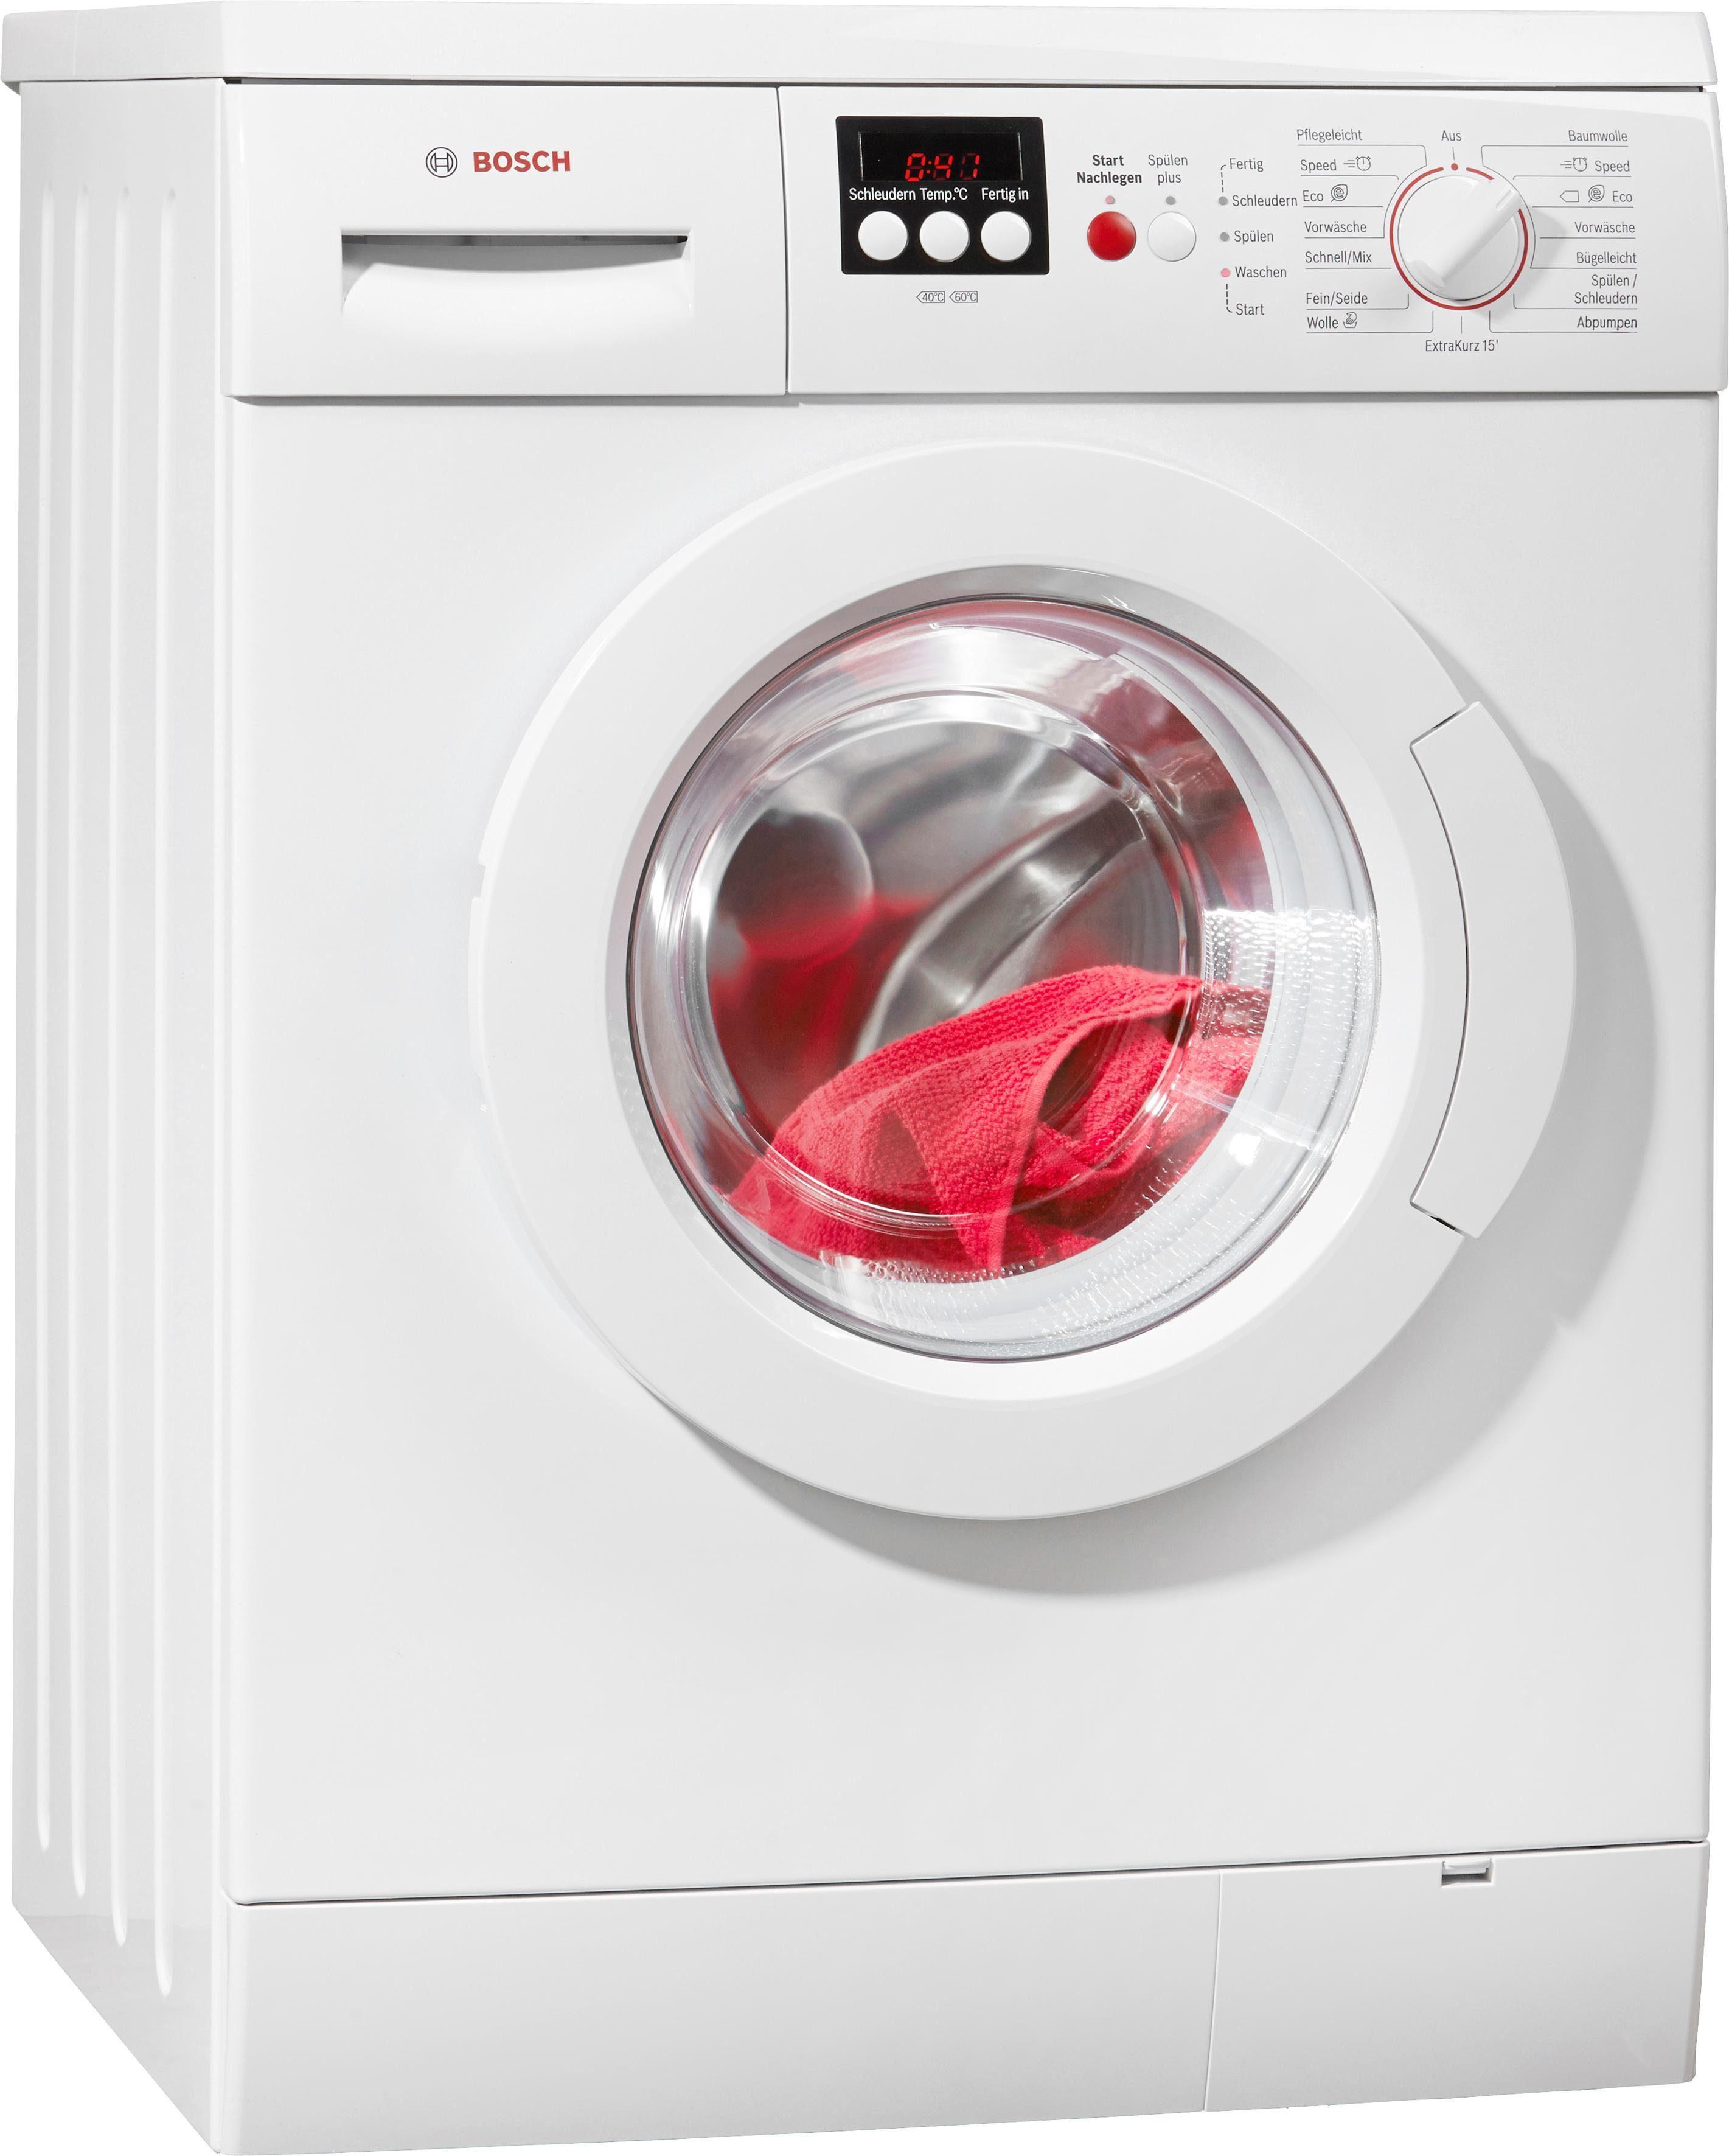 BOSCH Waschmaschine Serie 4 WAE282V7, A+++, 7 kg, 1400 U/Min